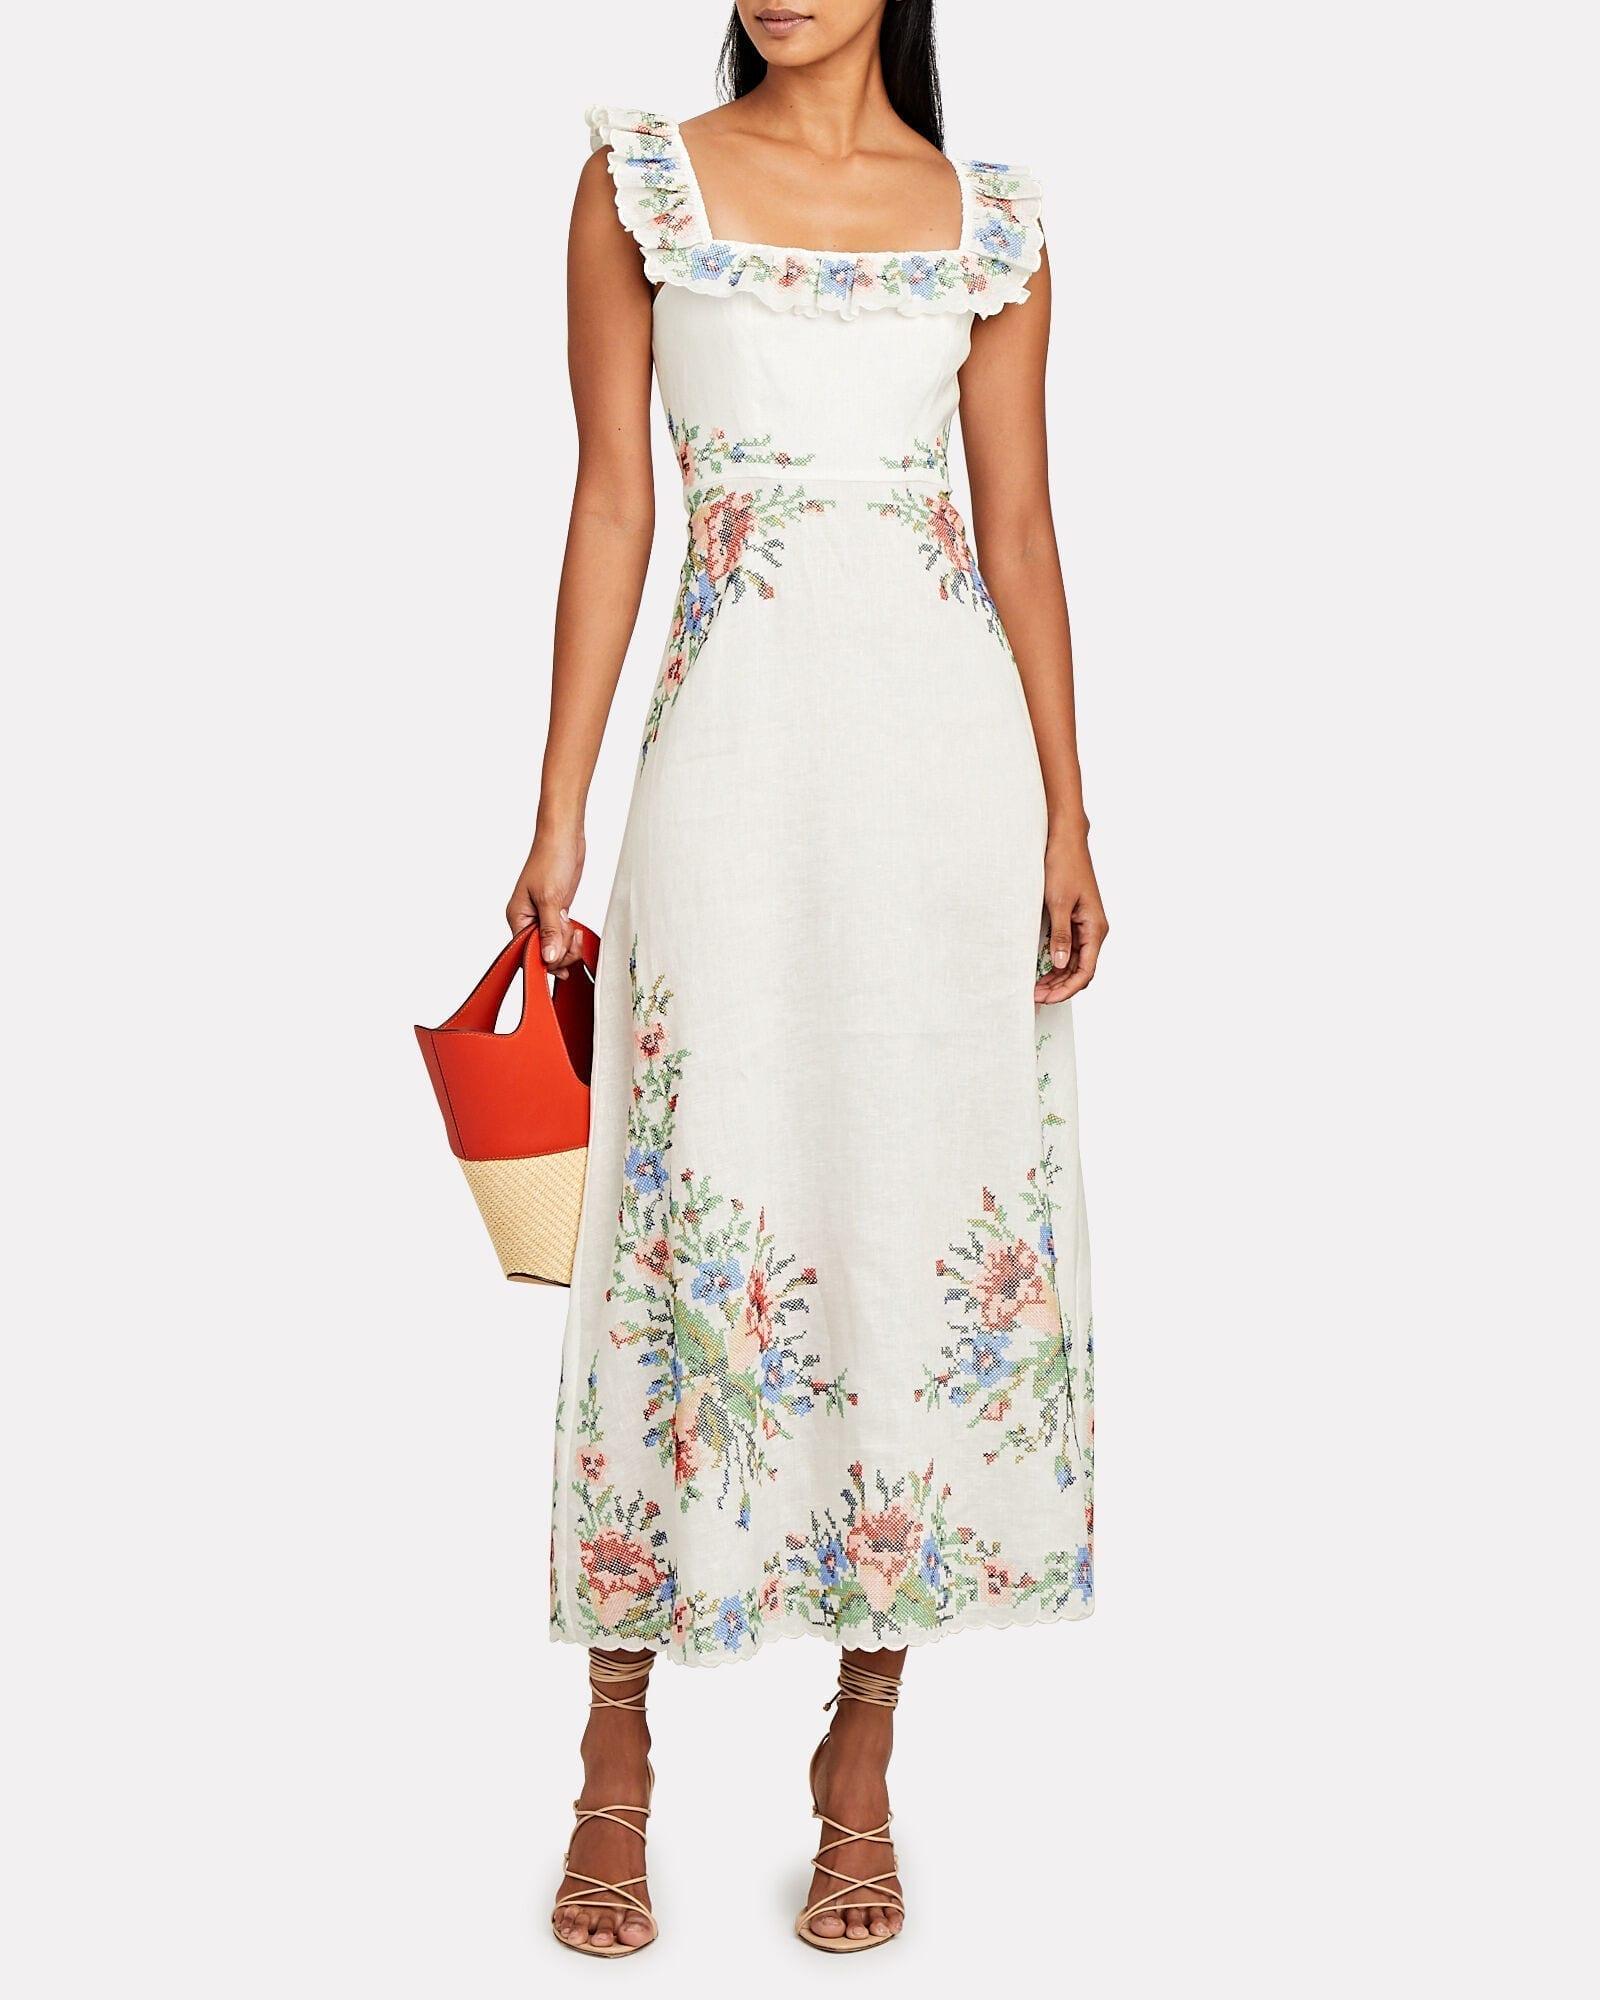 ZIMMERMANN Juliette Ruffled Floral Midi Dress